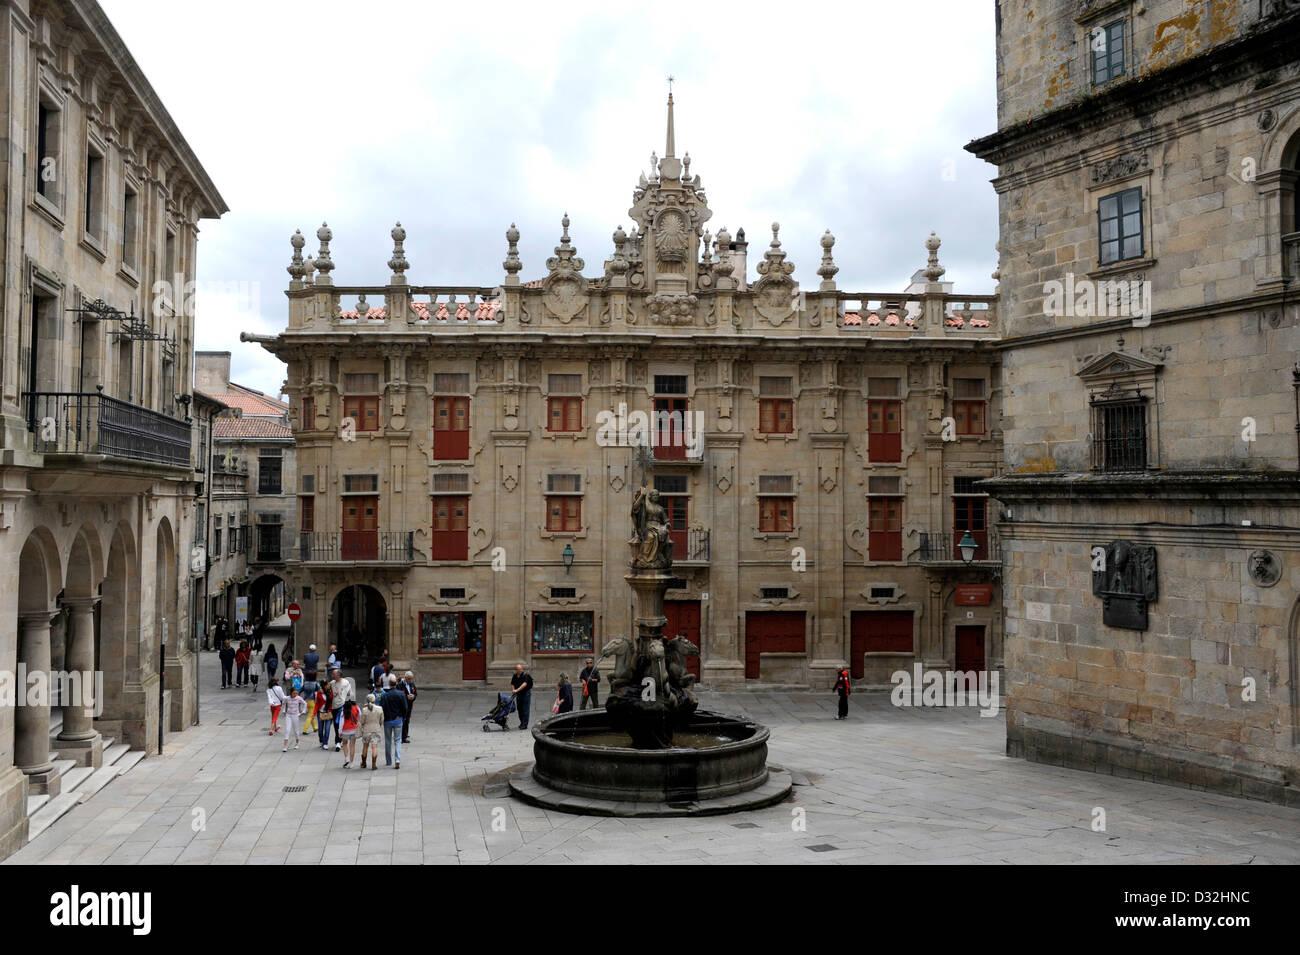 Santiago de Compostela,Pilgrimage,Way of St. James,La Coruna province,Galicia,Spain,UNESCO World Heritage - Stock Image